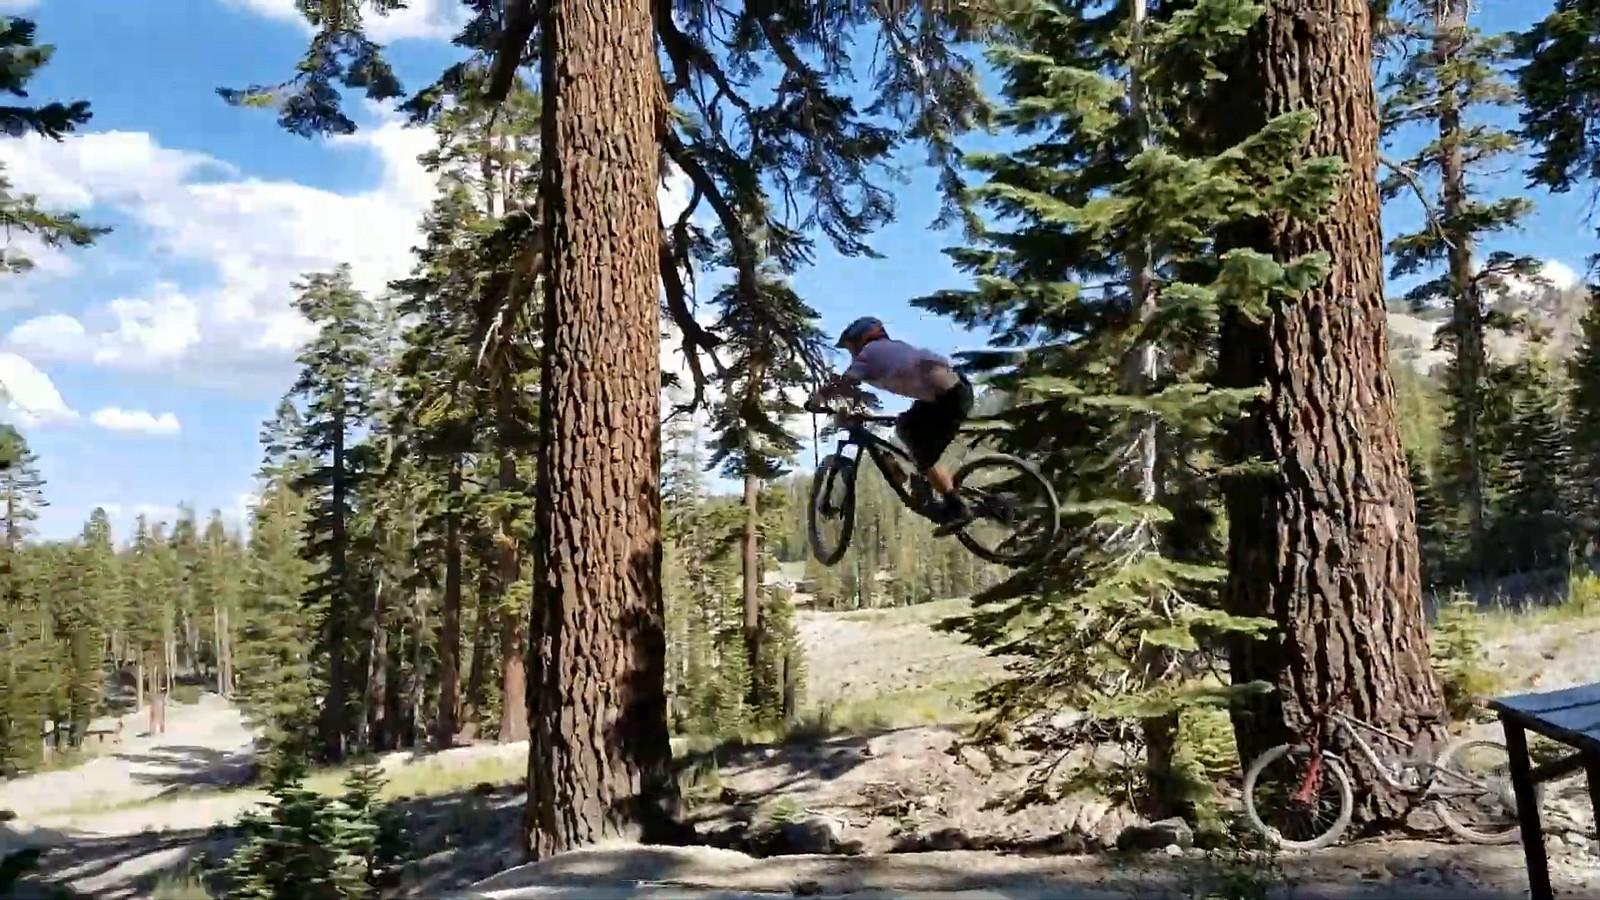 Mammo - switzb15 - Mountain Biking Pictures - Vital MTB